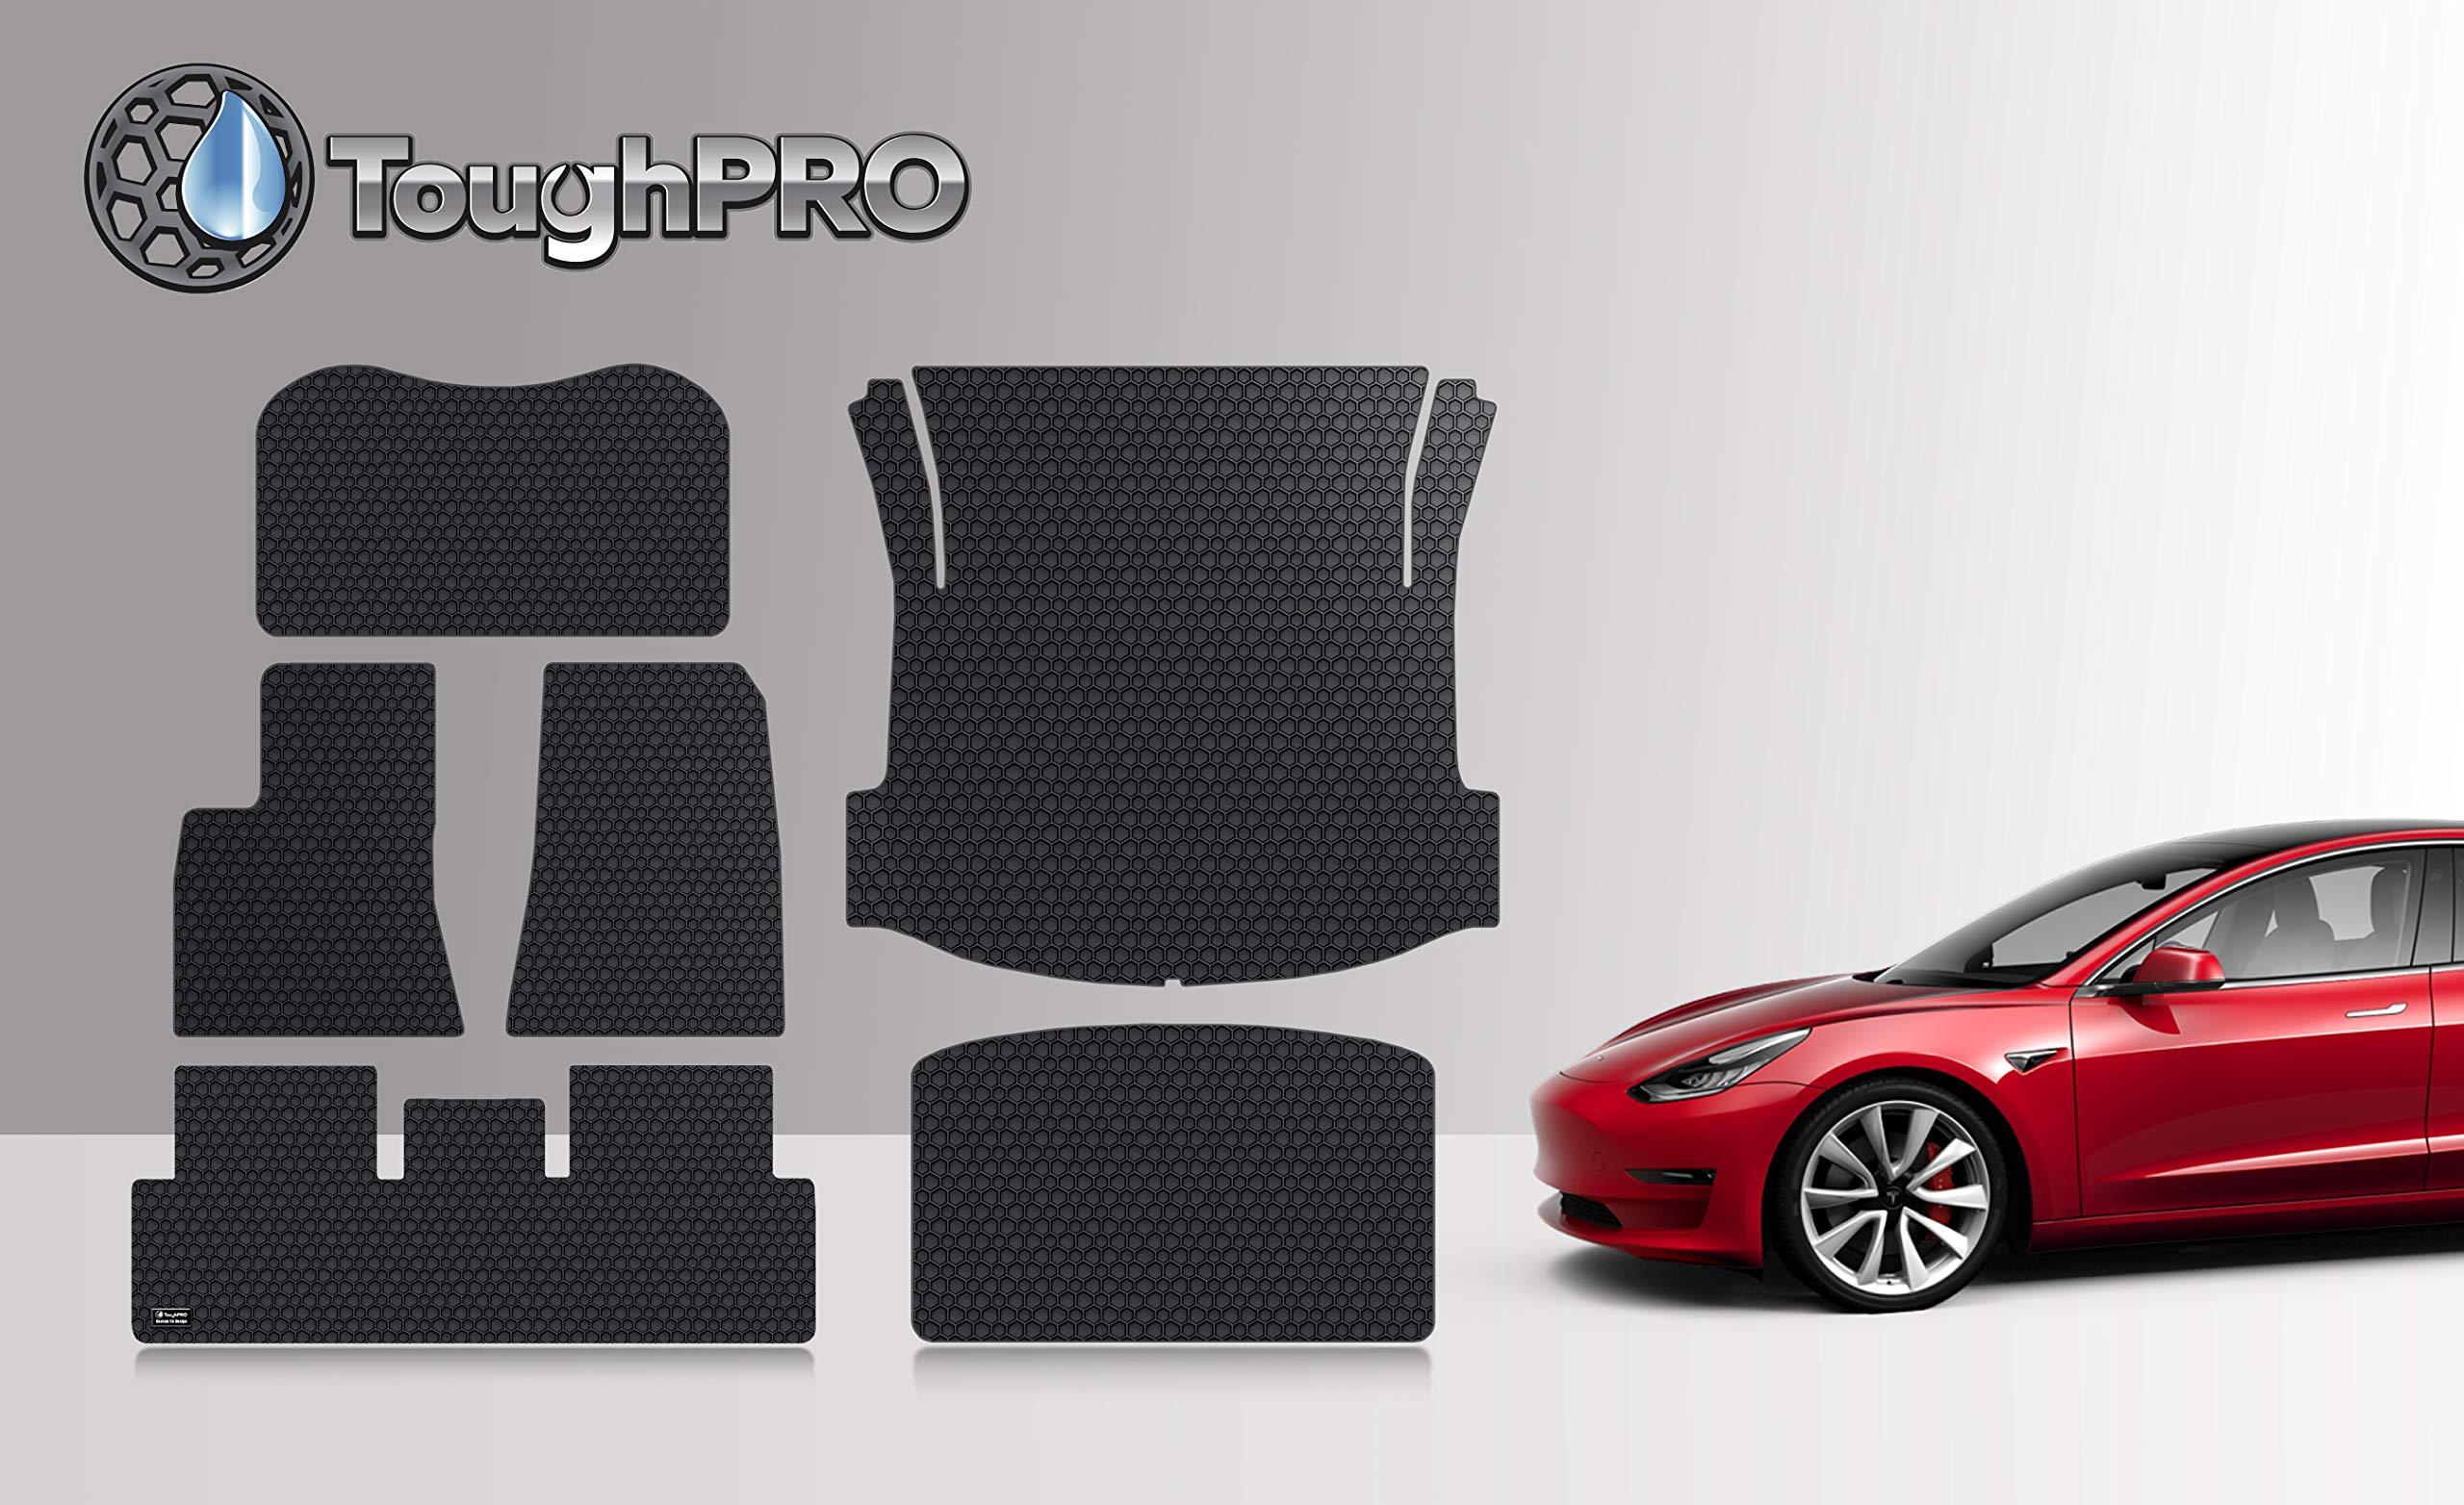 ToughPRO Tesla Model 3 Floor Mats Set - Frunk Mat - Trunk Mat- Storage Mat - All Weather - Heavy Duty - Black Rubber - (Made in The USA) - 2019 by ToughPRO (Image #1)